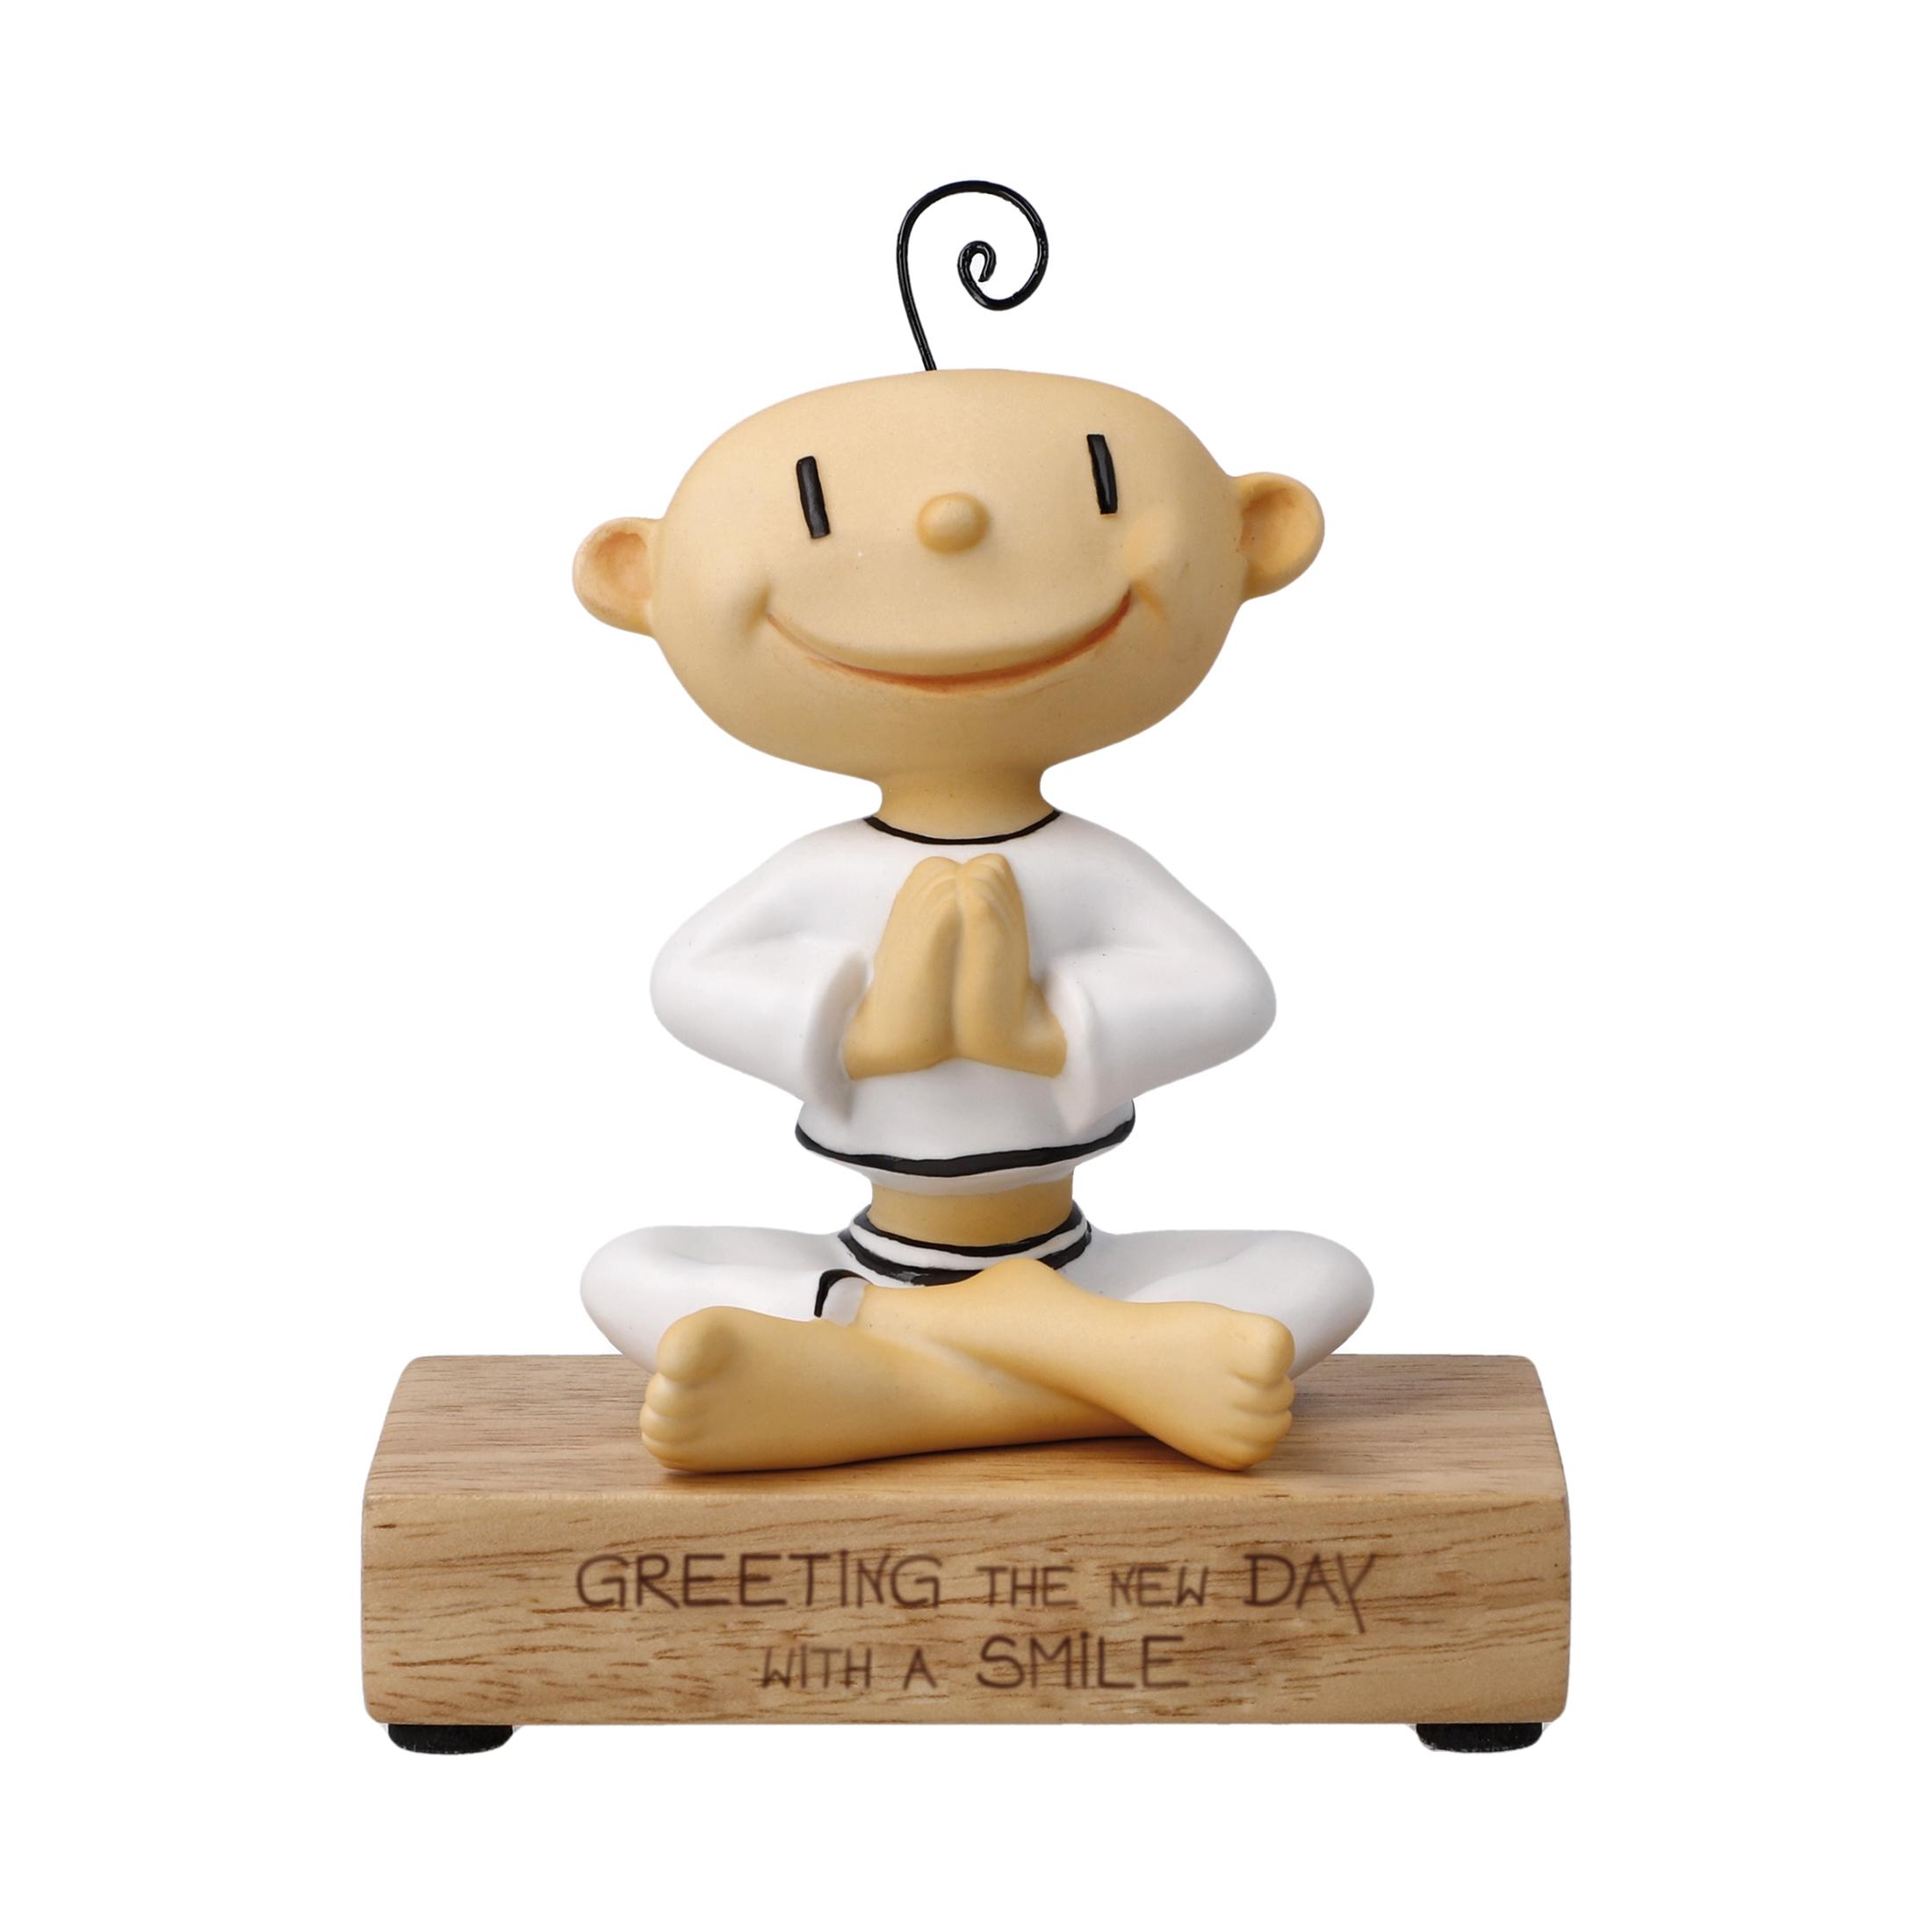 Goebel Der kleine Yogi® Wohnaccessoires 'KY P Greeting the new day 13' 2021 !